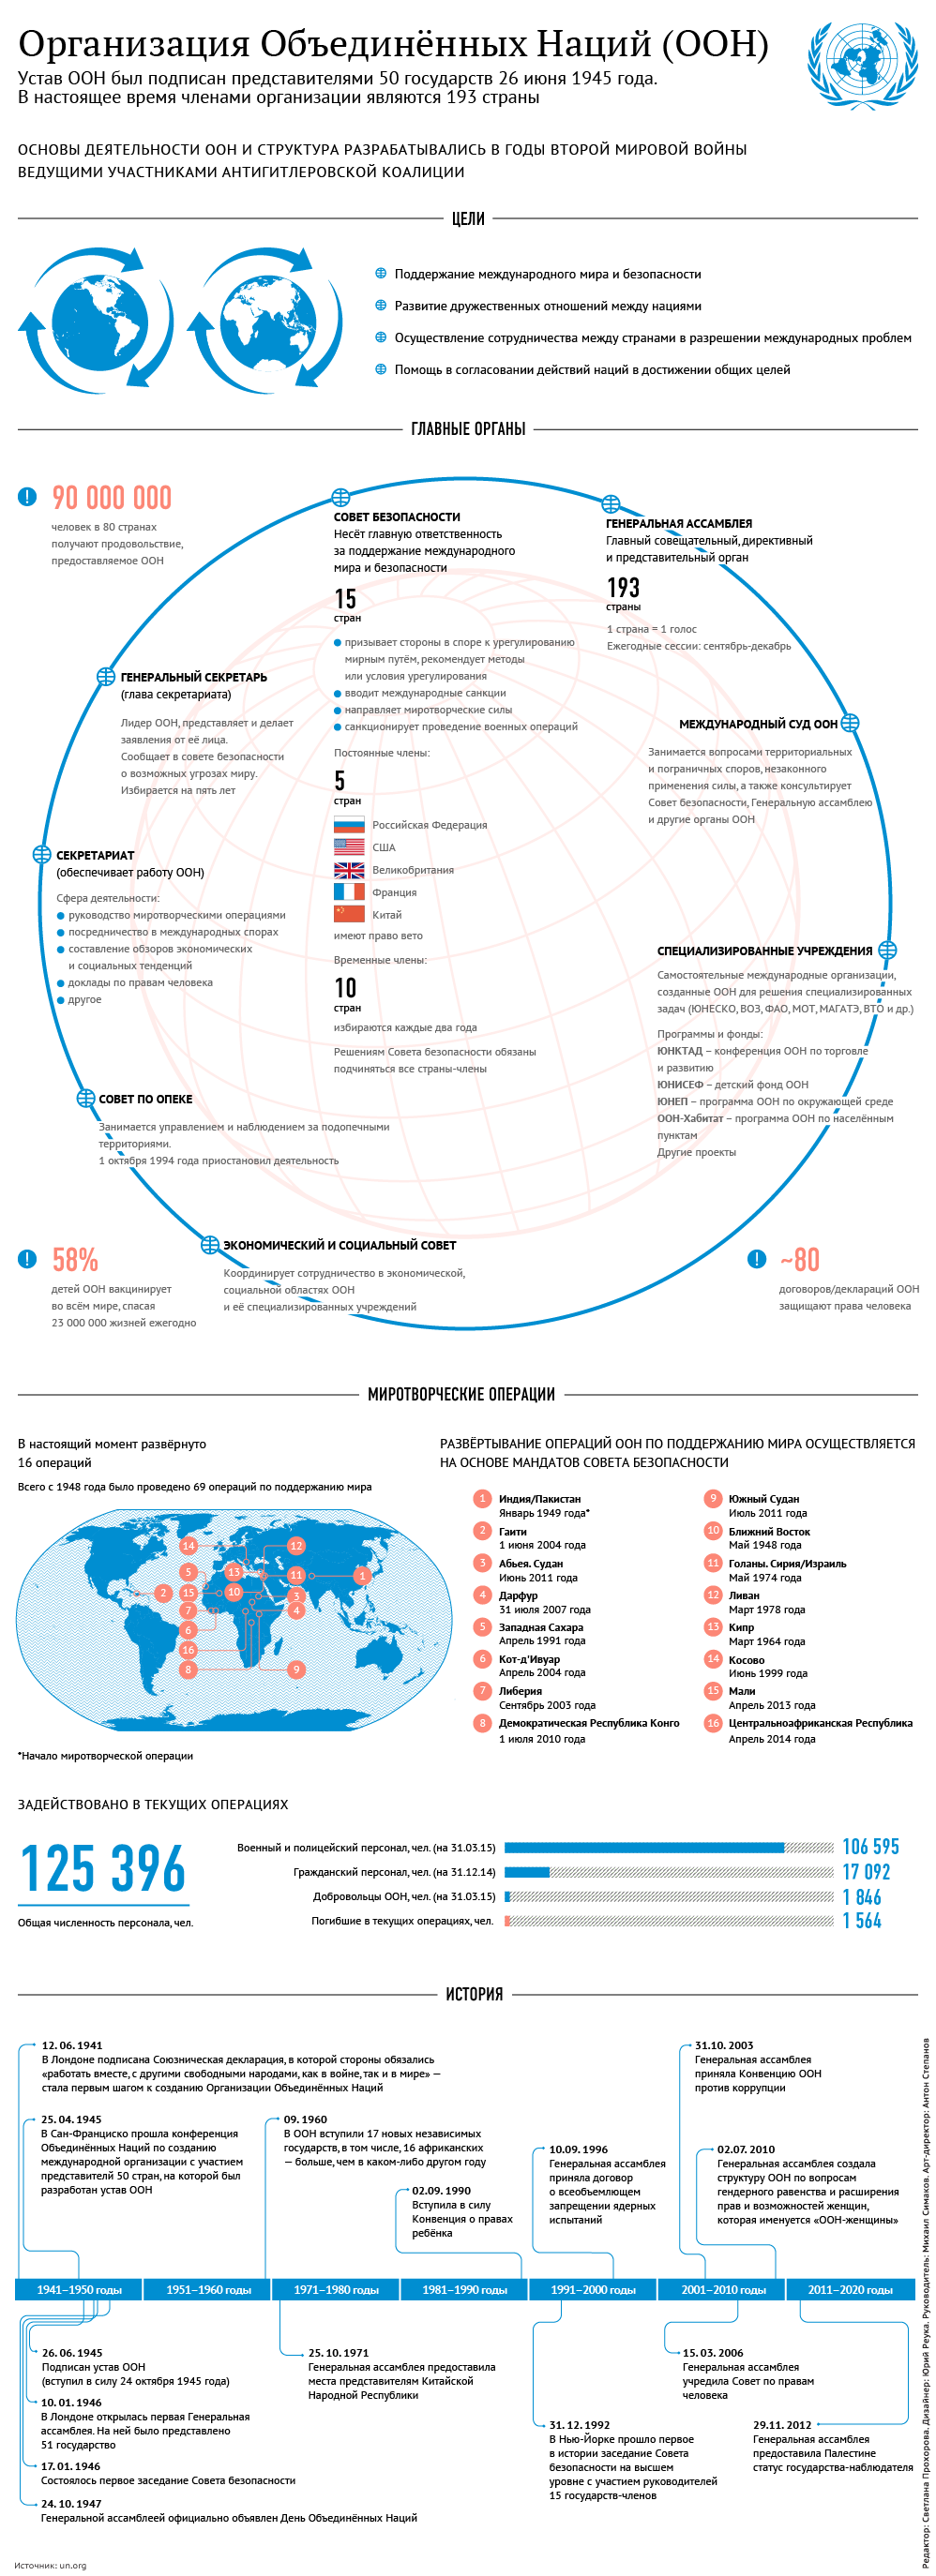 Организация Объединённых Наций (ООН)